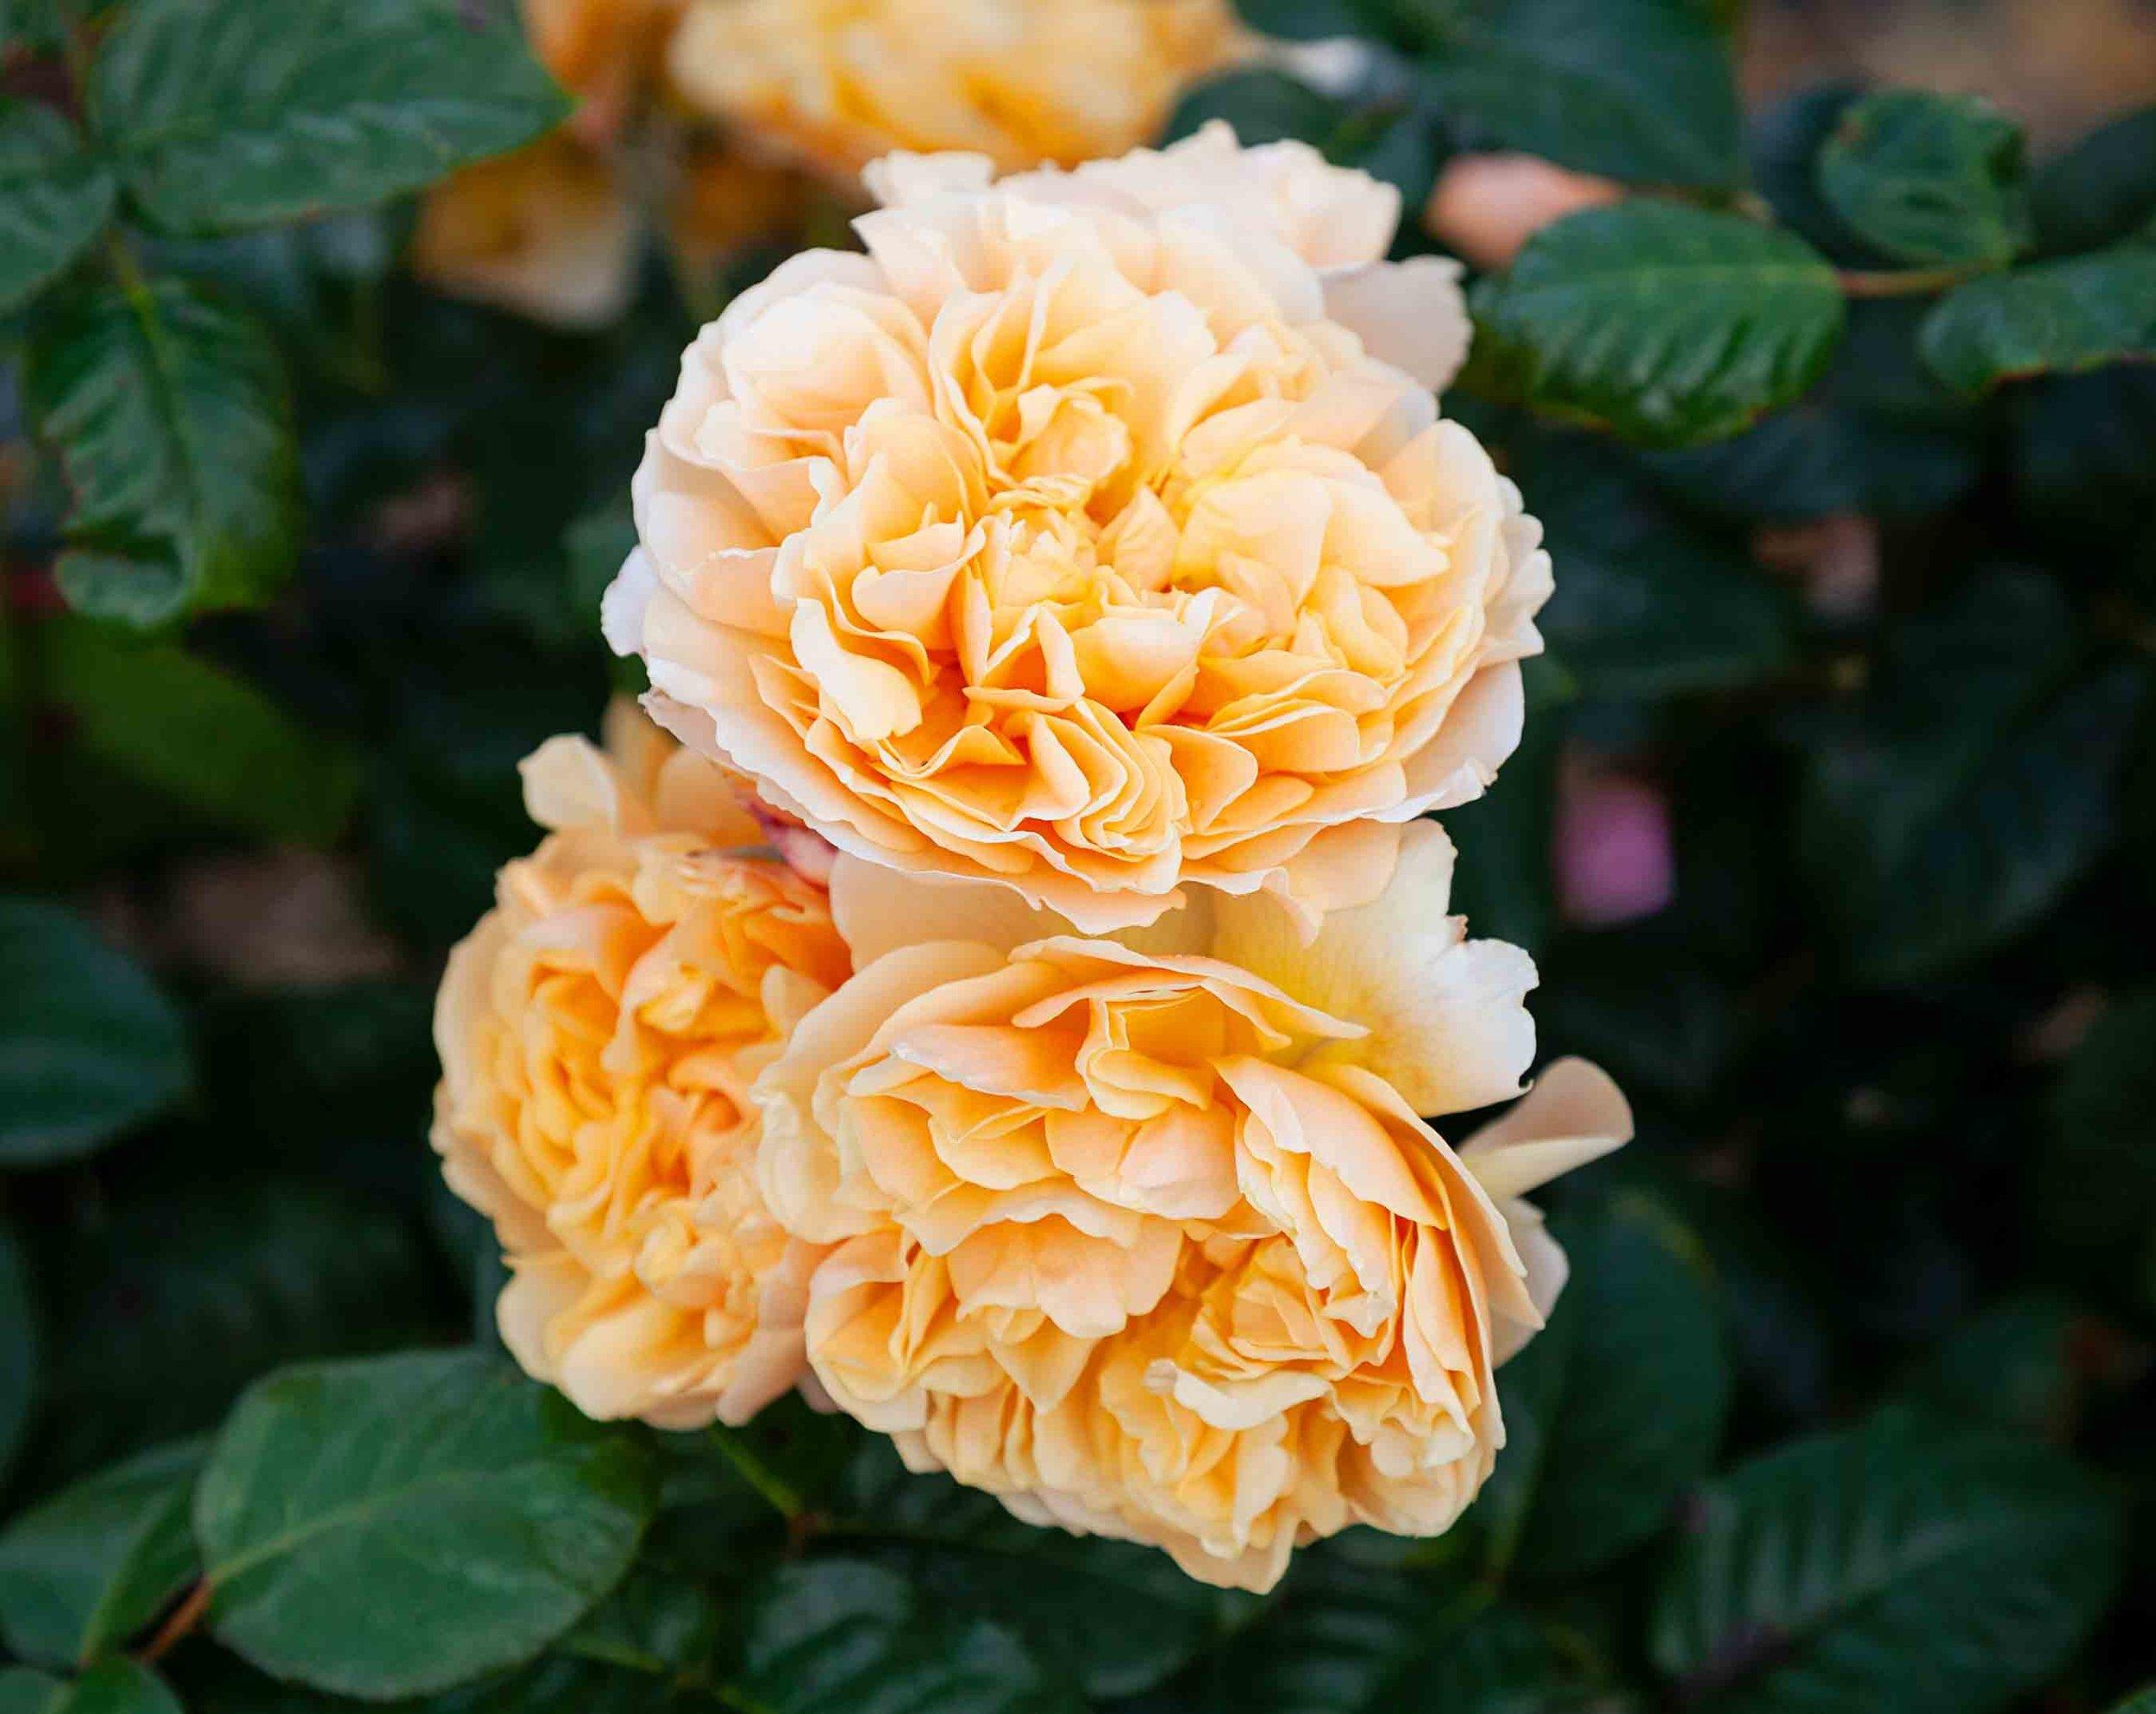 roses-reduced-12.jpg